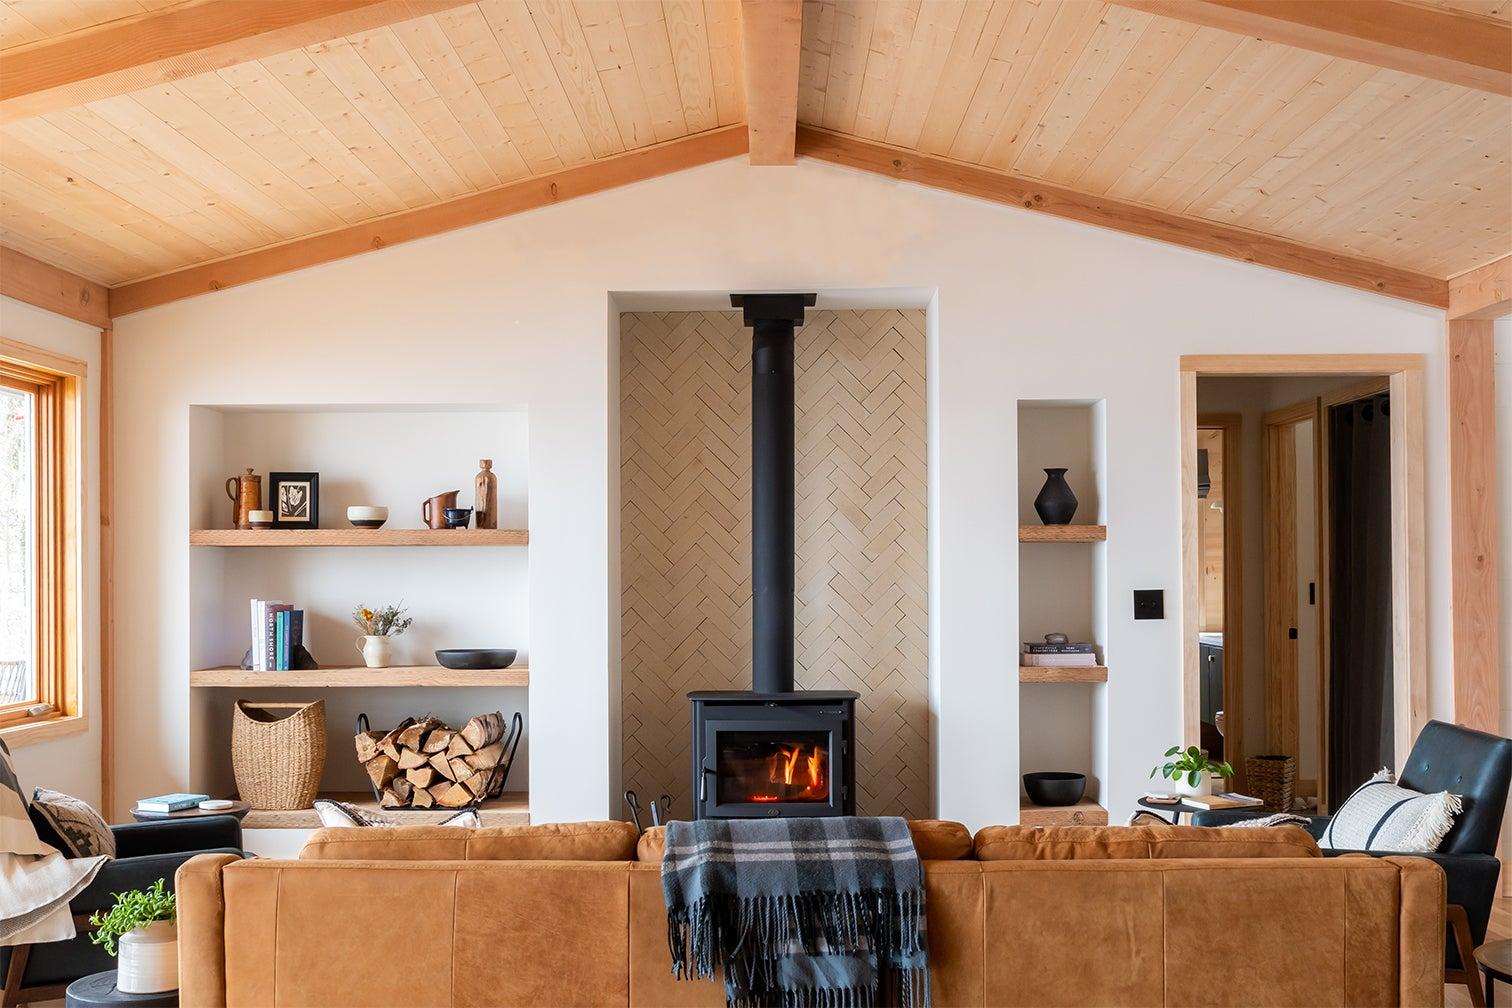 brown leather sofa facing wood-burning stove